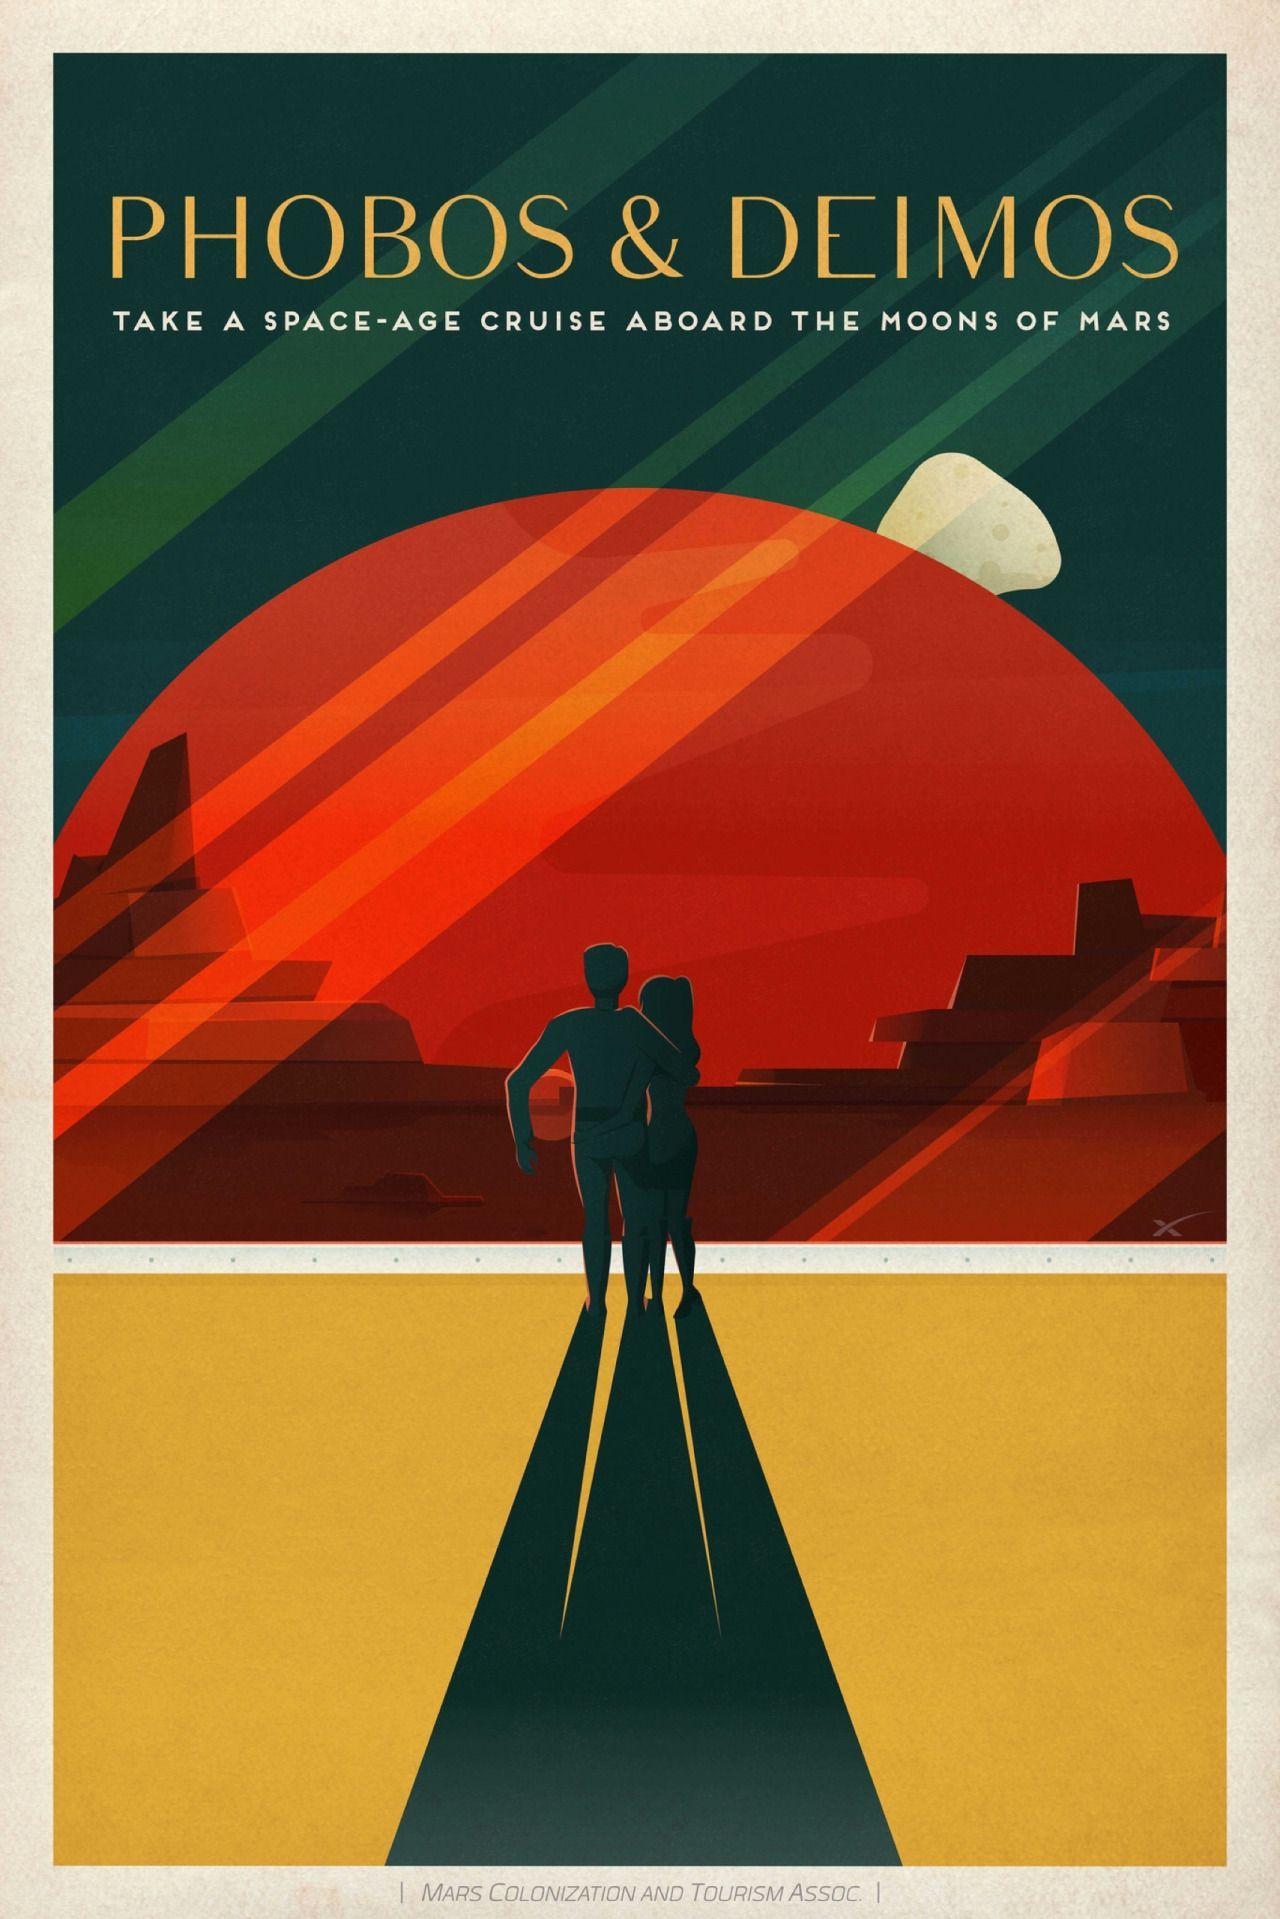 Nasa Space Tourism Poster Phobos & Deimos